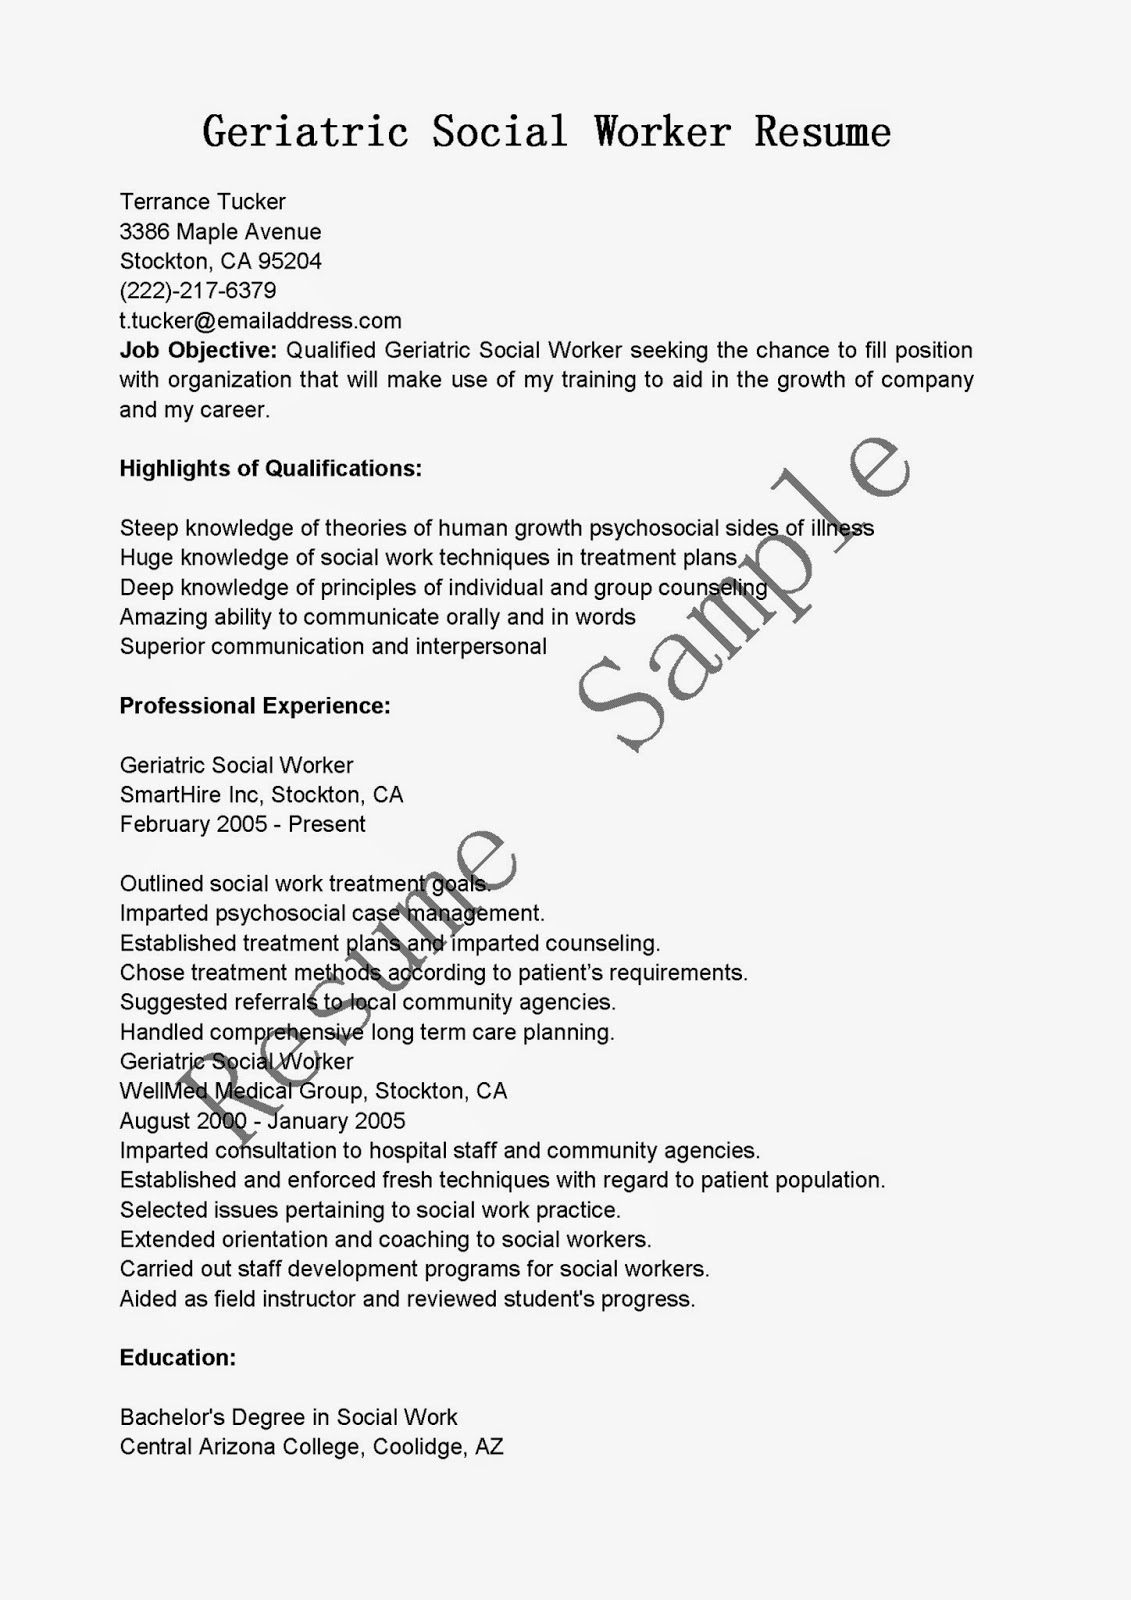 Resume Samples Geriatric Social Worker Resume Sample